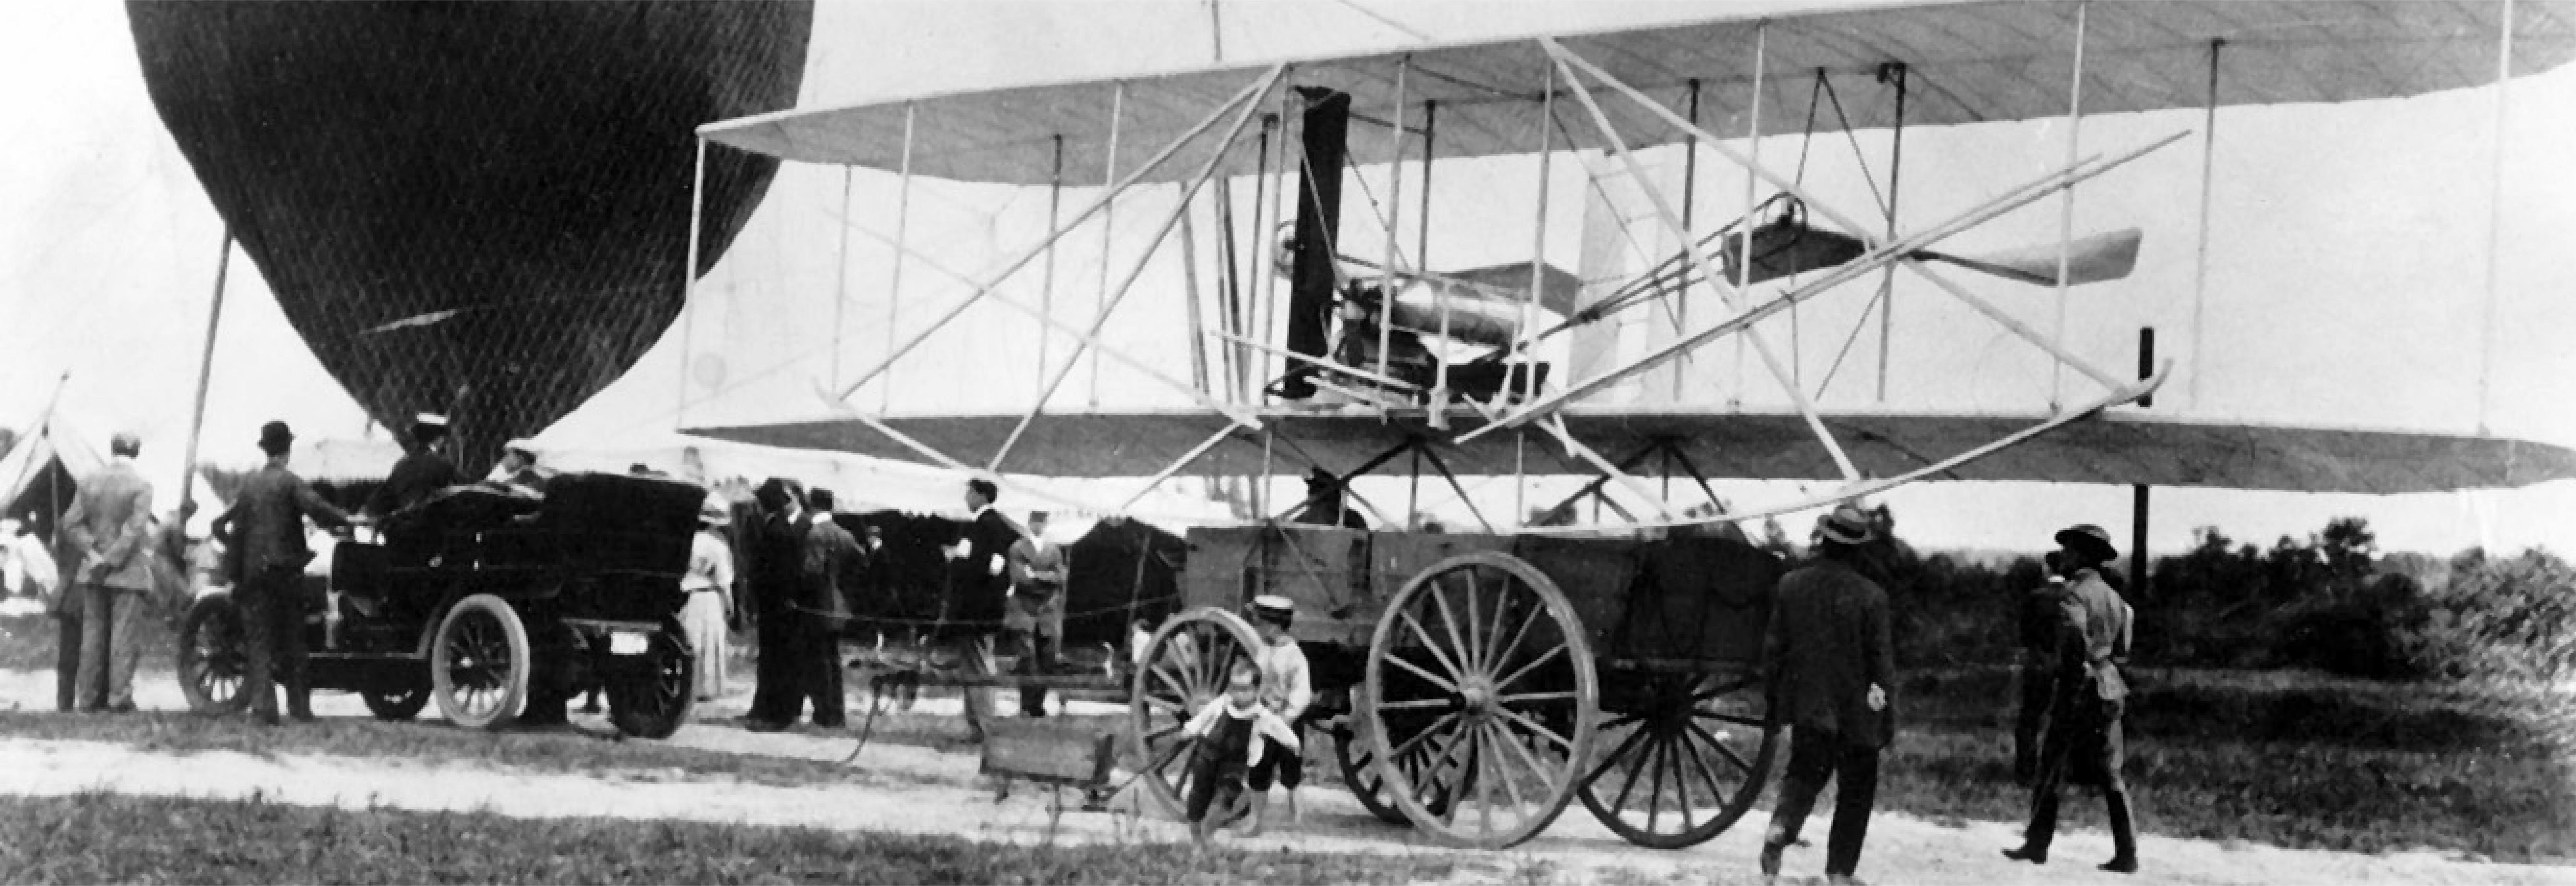 Dawn of Military Aviation